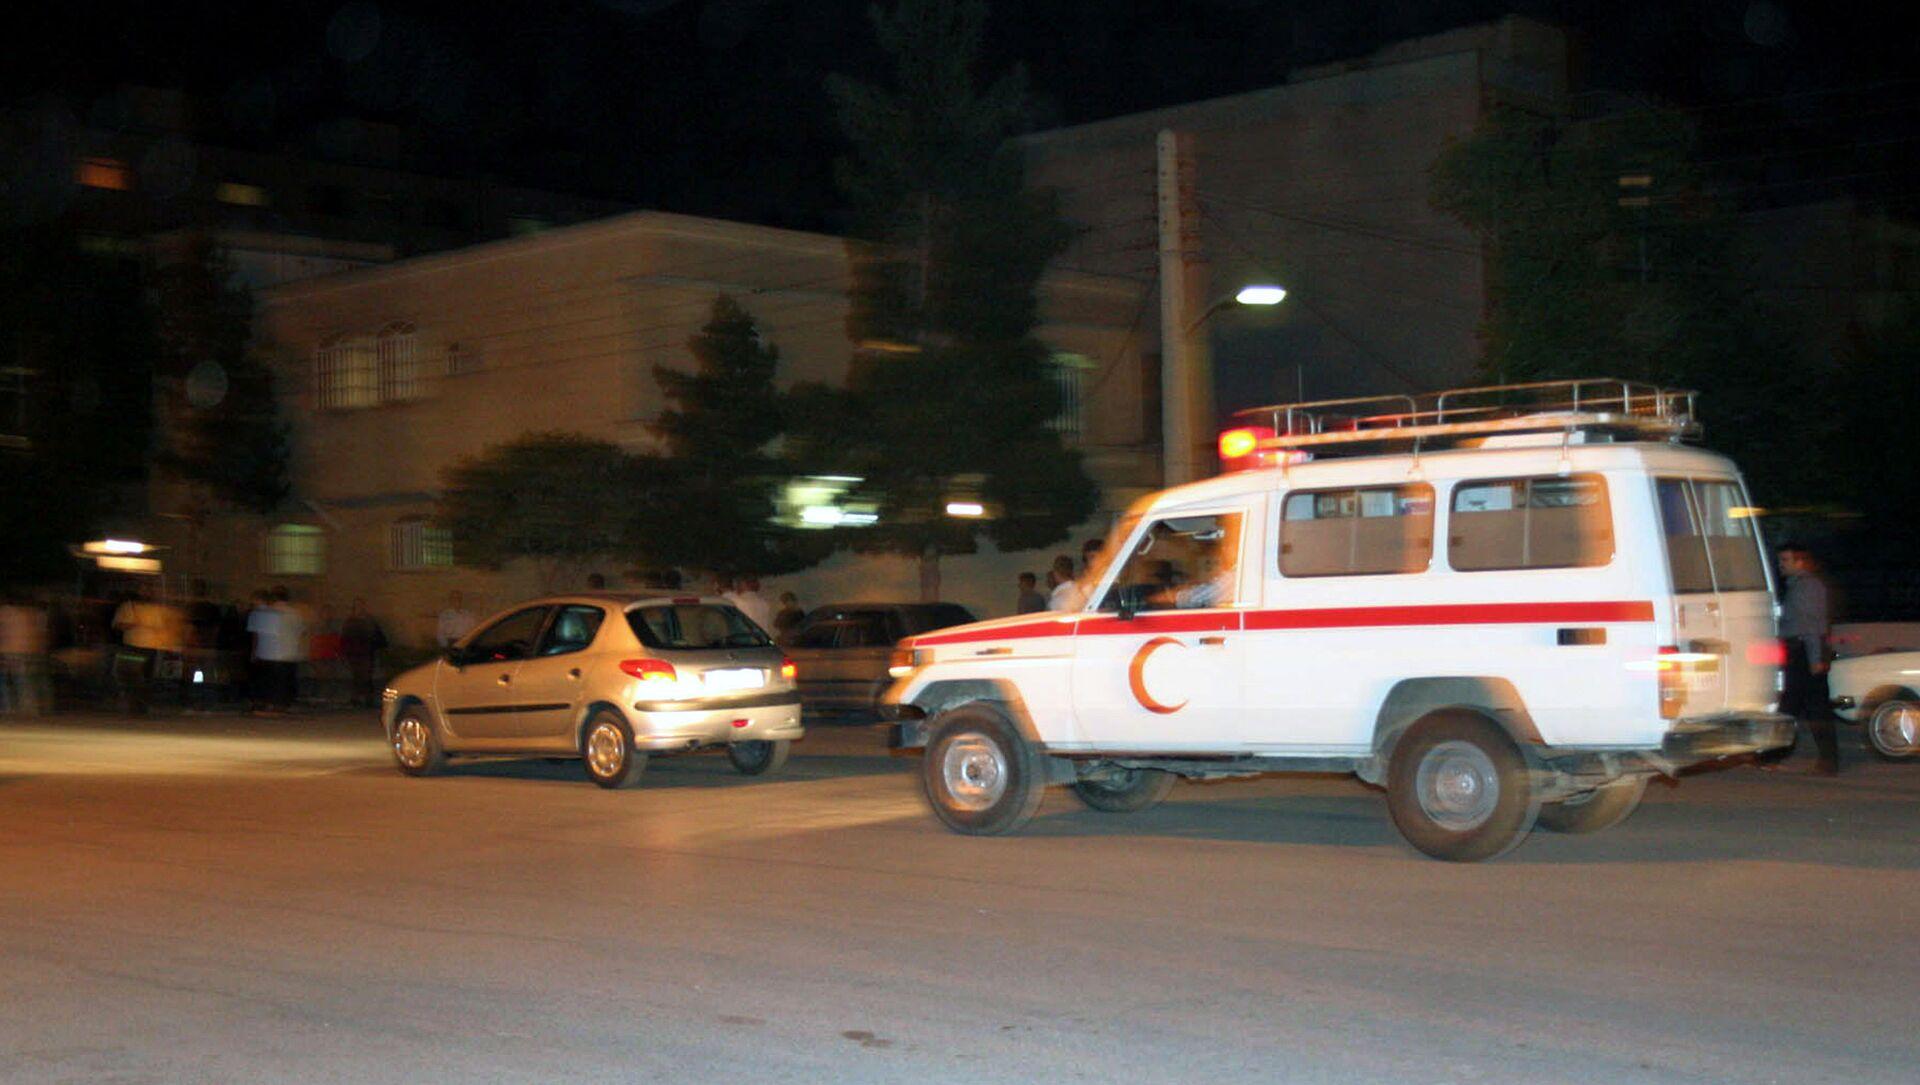 Tehran ambulance - Sputnik International, 1920, 02.08.2021